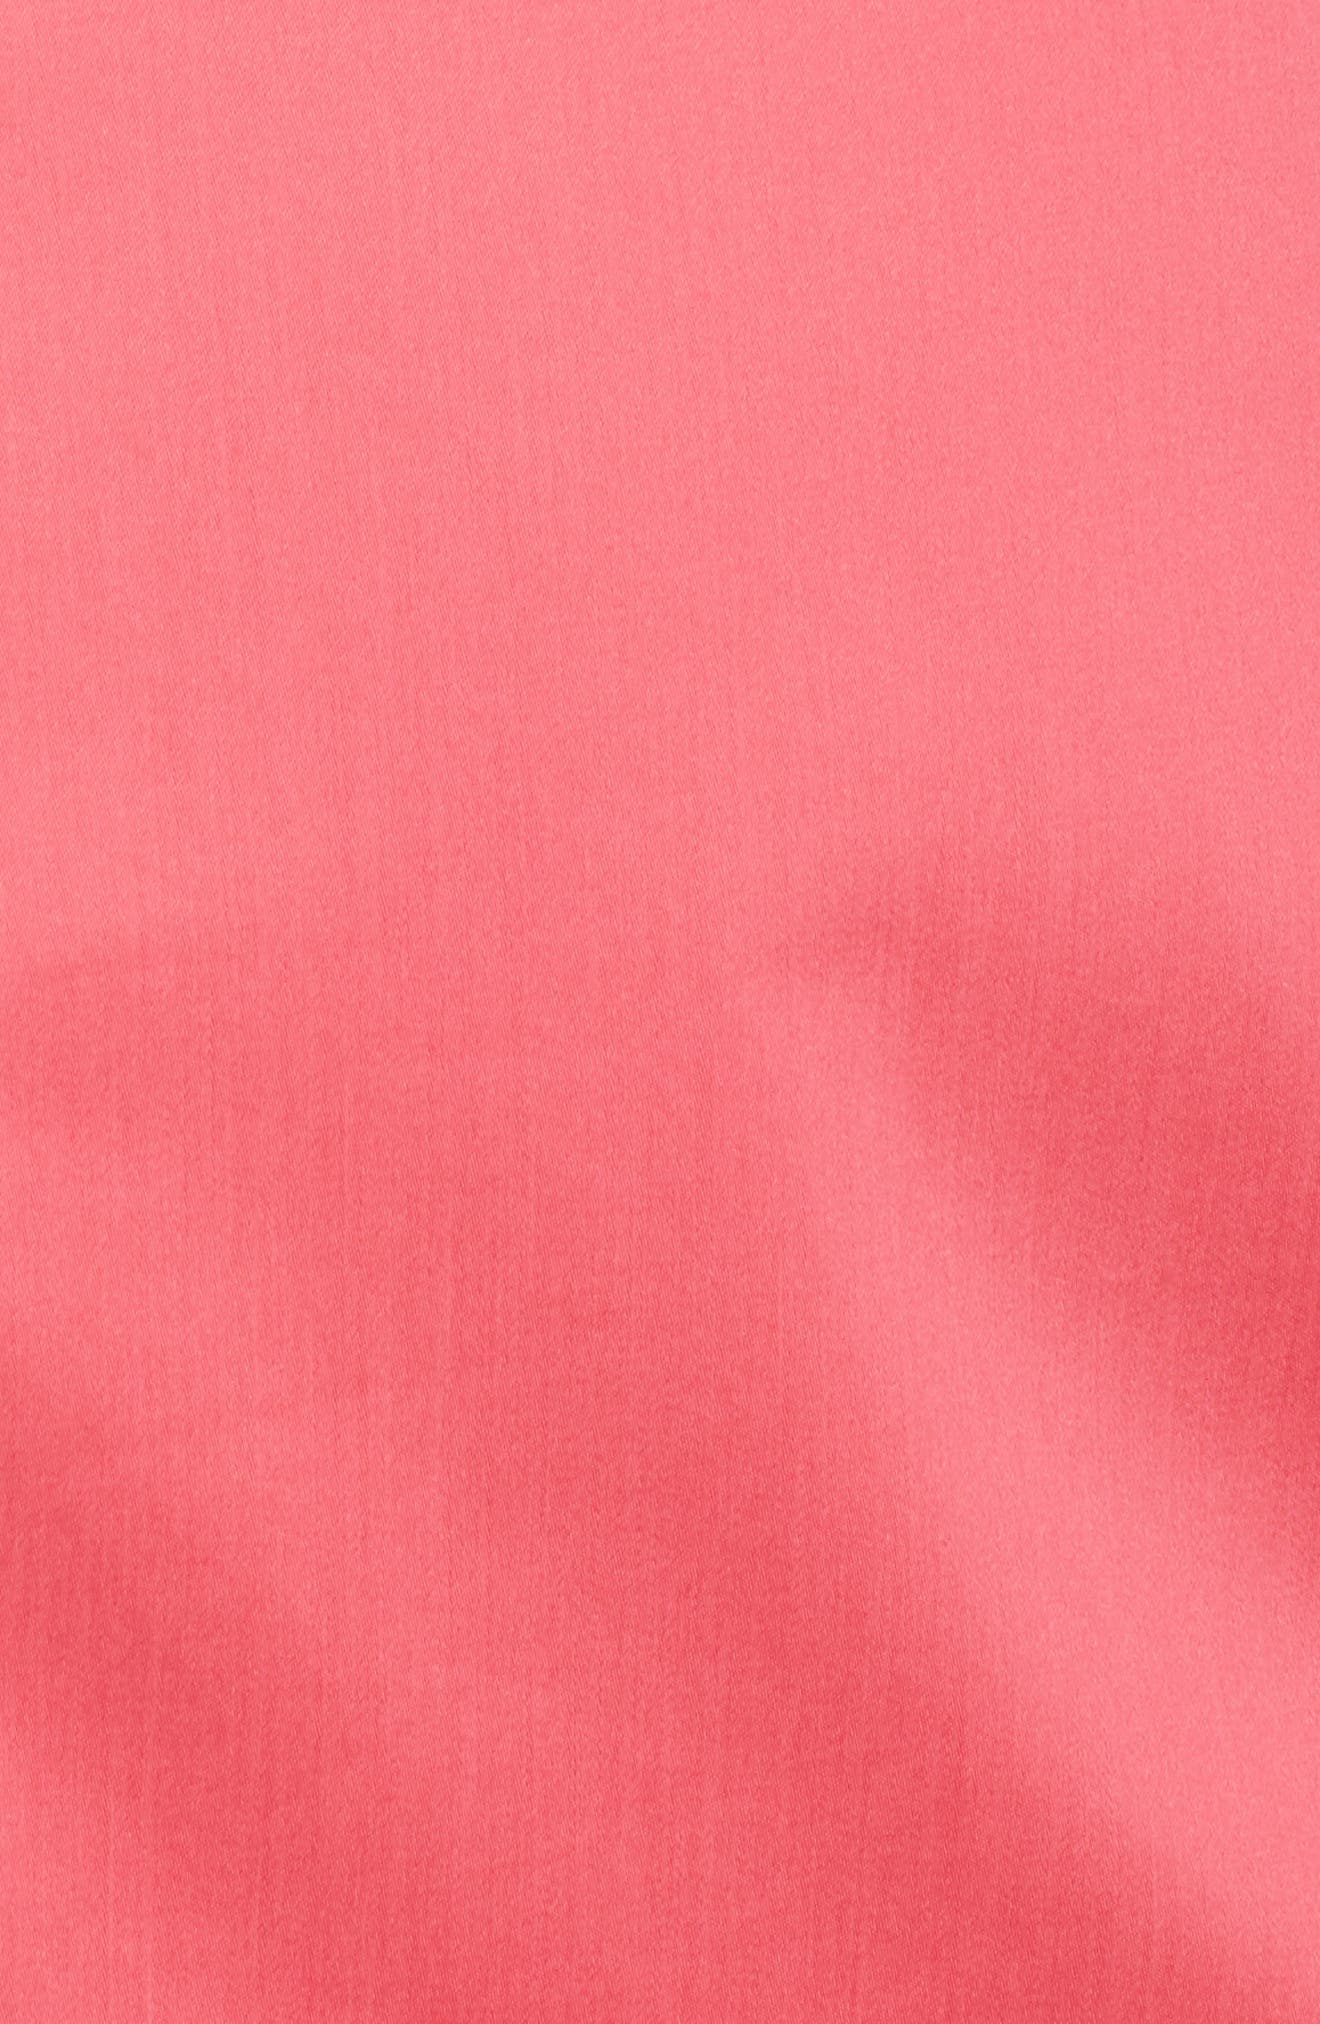 Dasali V-Neck Sheath Dress,                             Alternate thumbnail 6, color,                             692